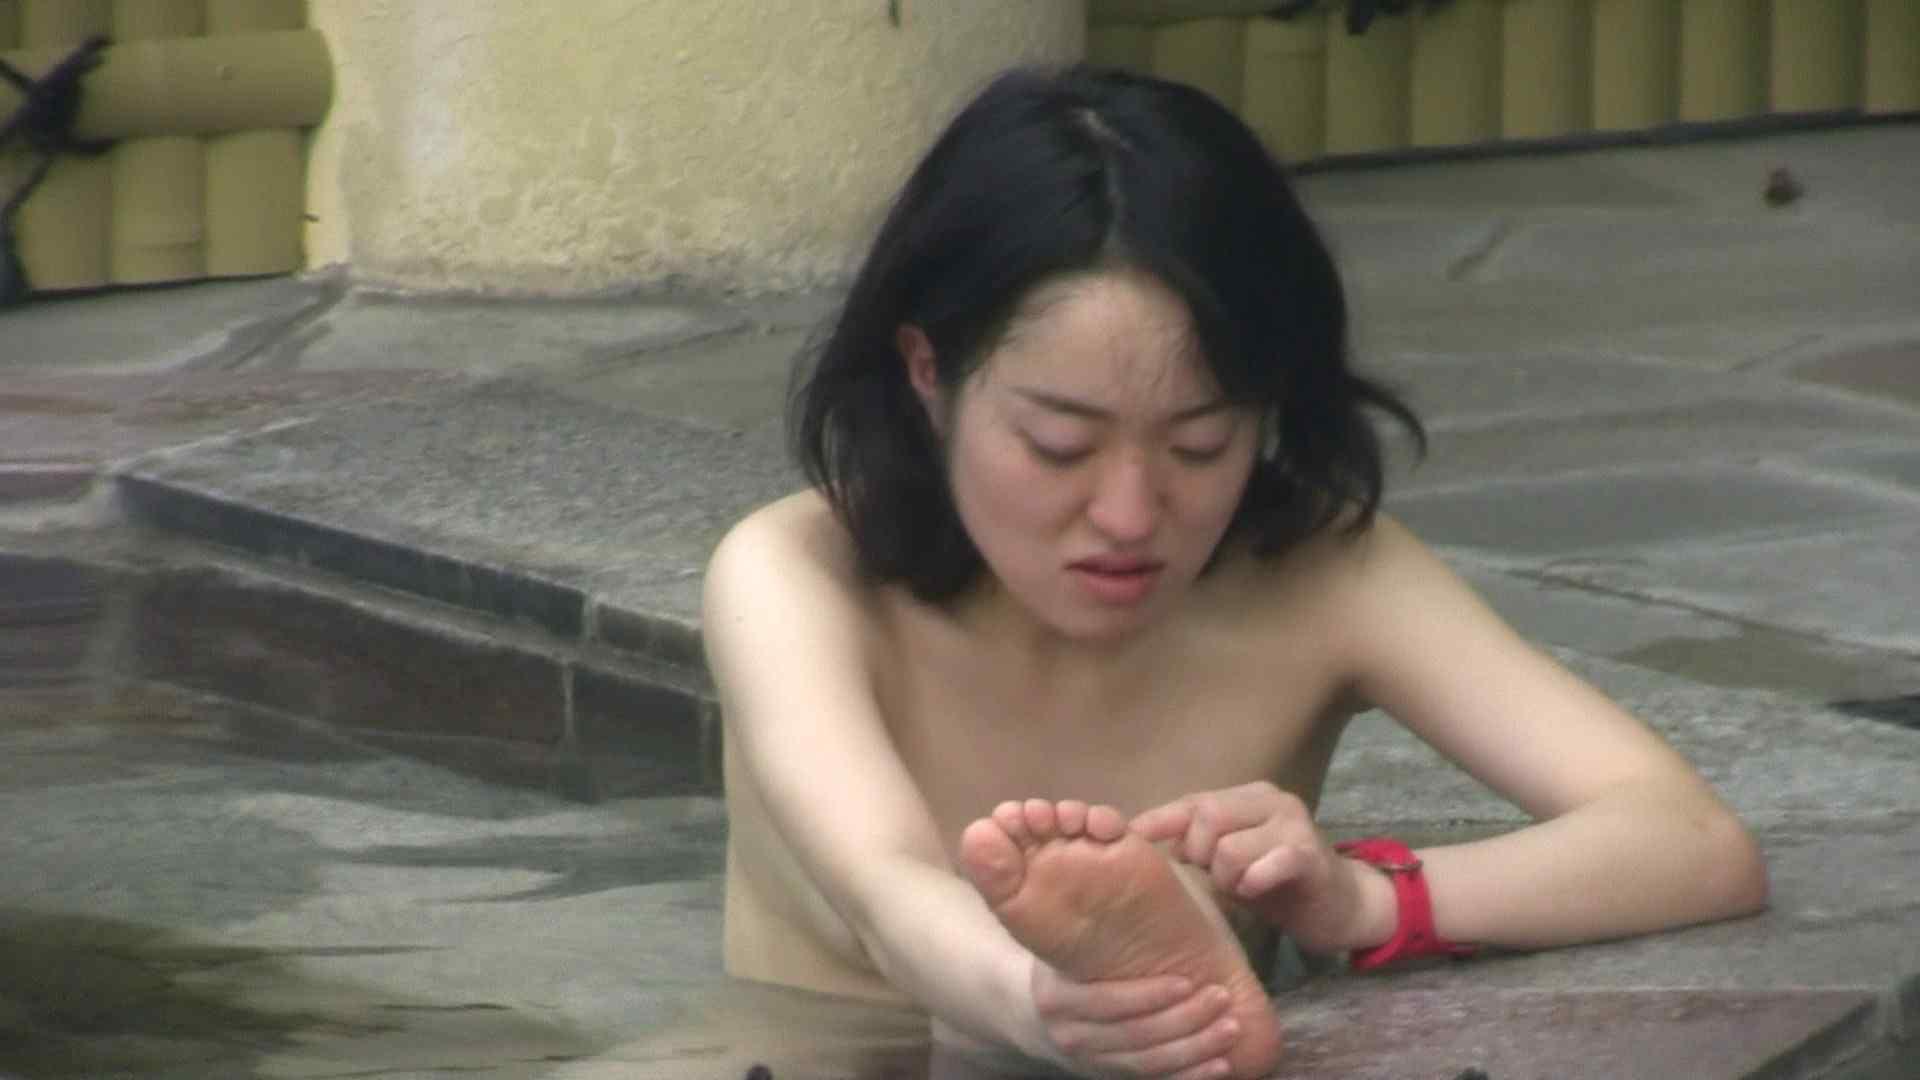 Aquaな露天風呂Vol.681 露天 | OLセックス  98画像 13